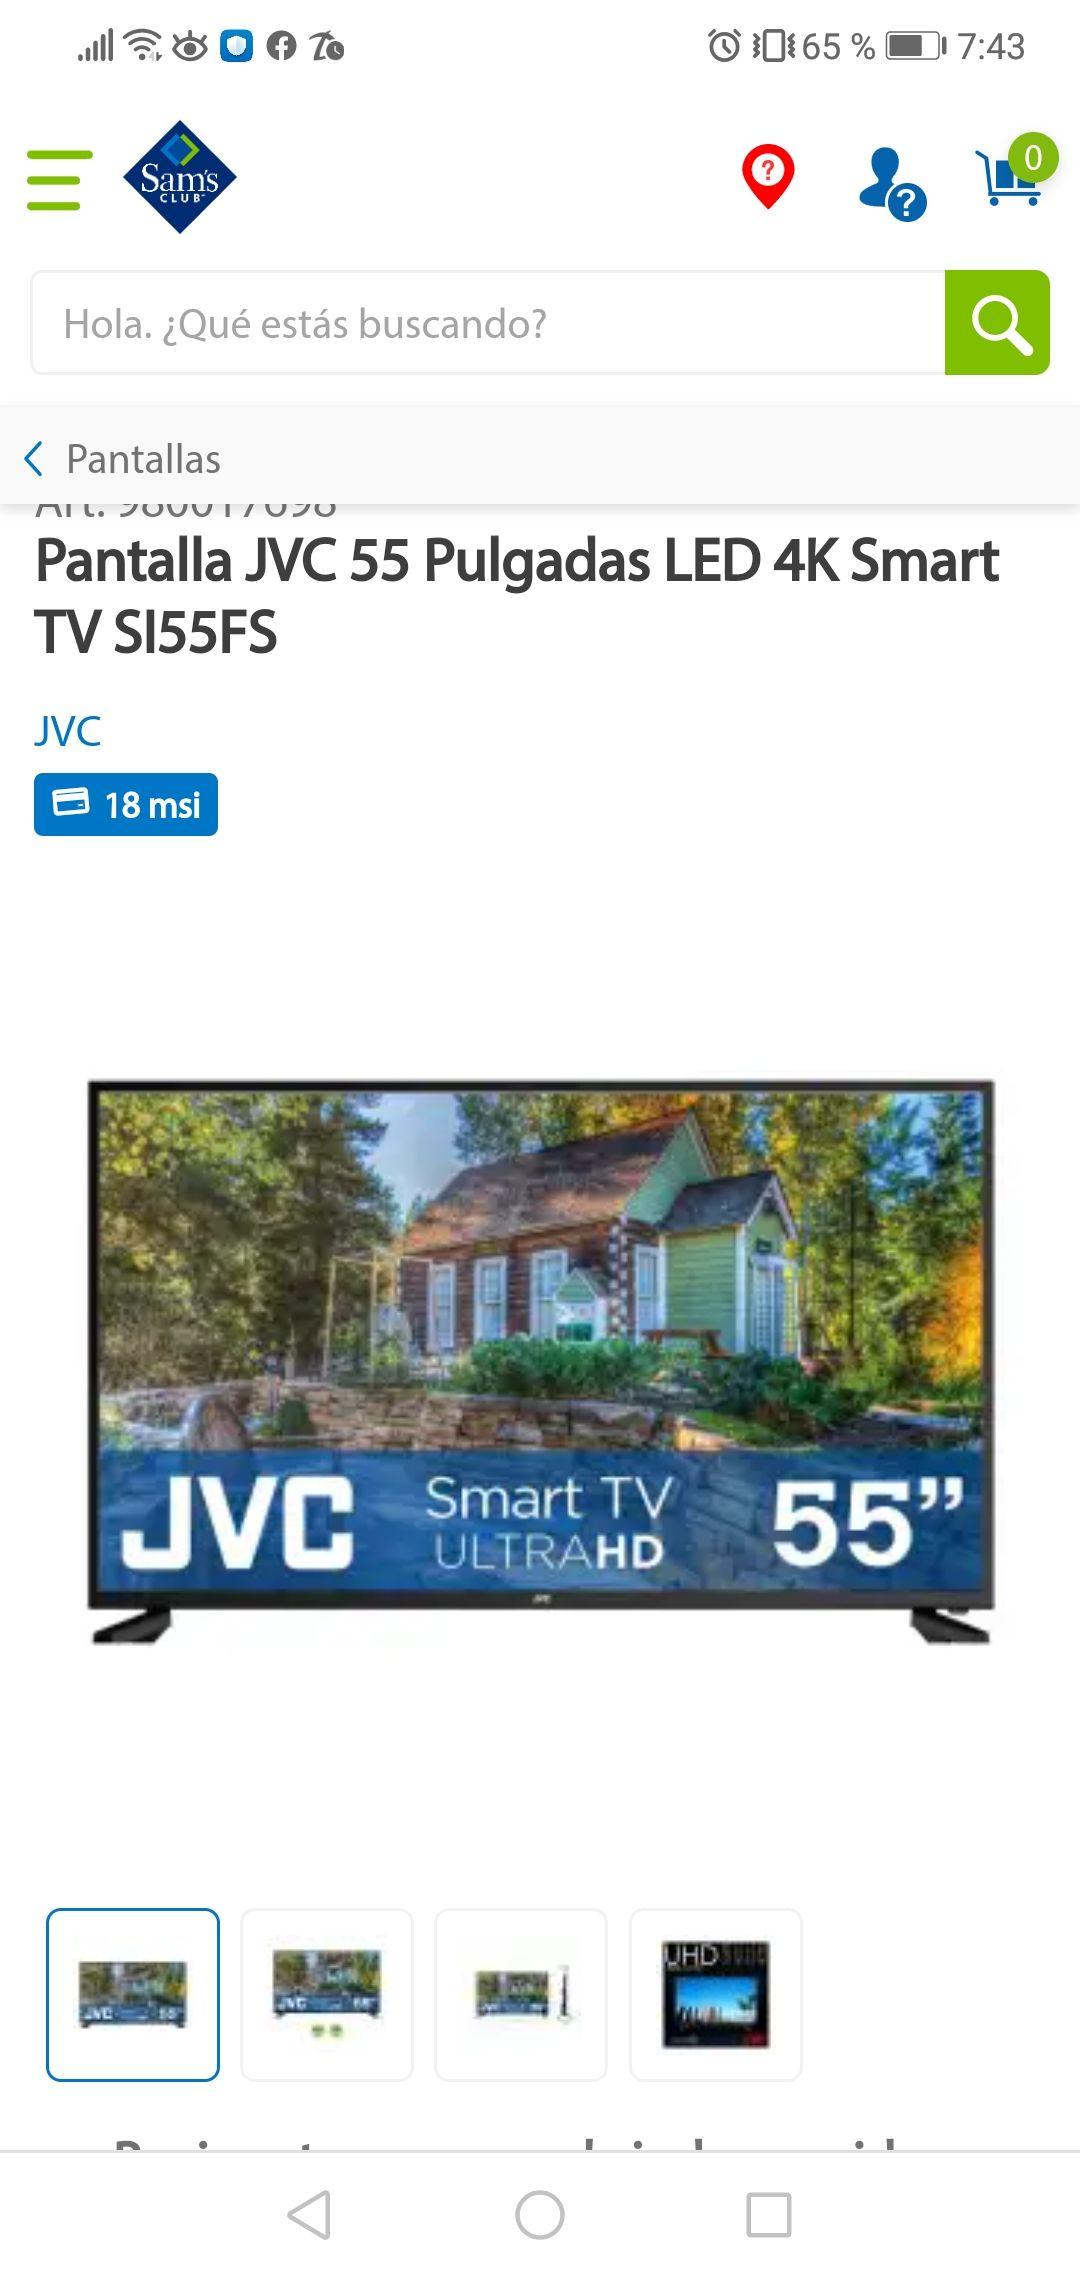 Pantalla JVC 55 Pulgadas LED 4K Smart TV SI55FS En sams club